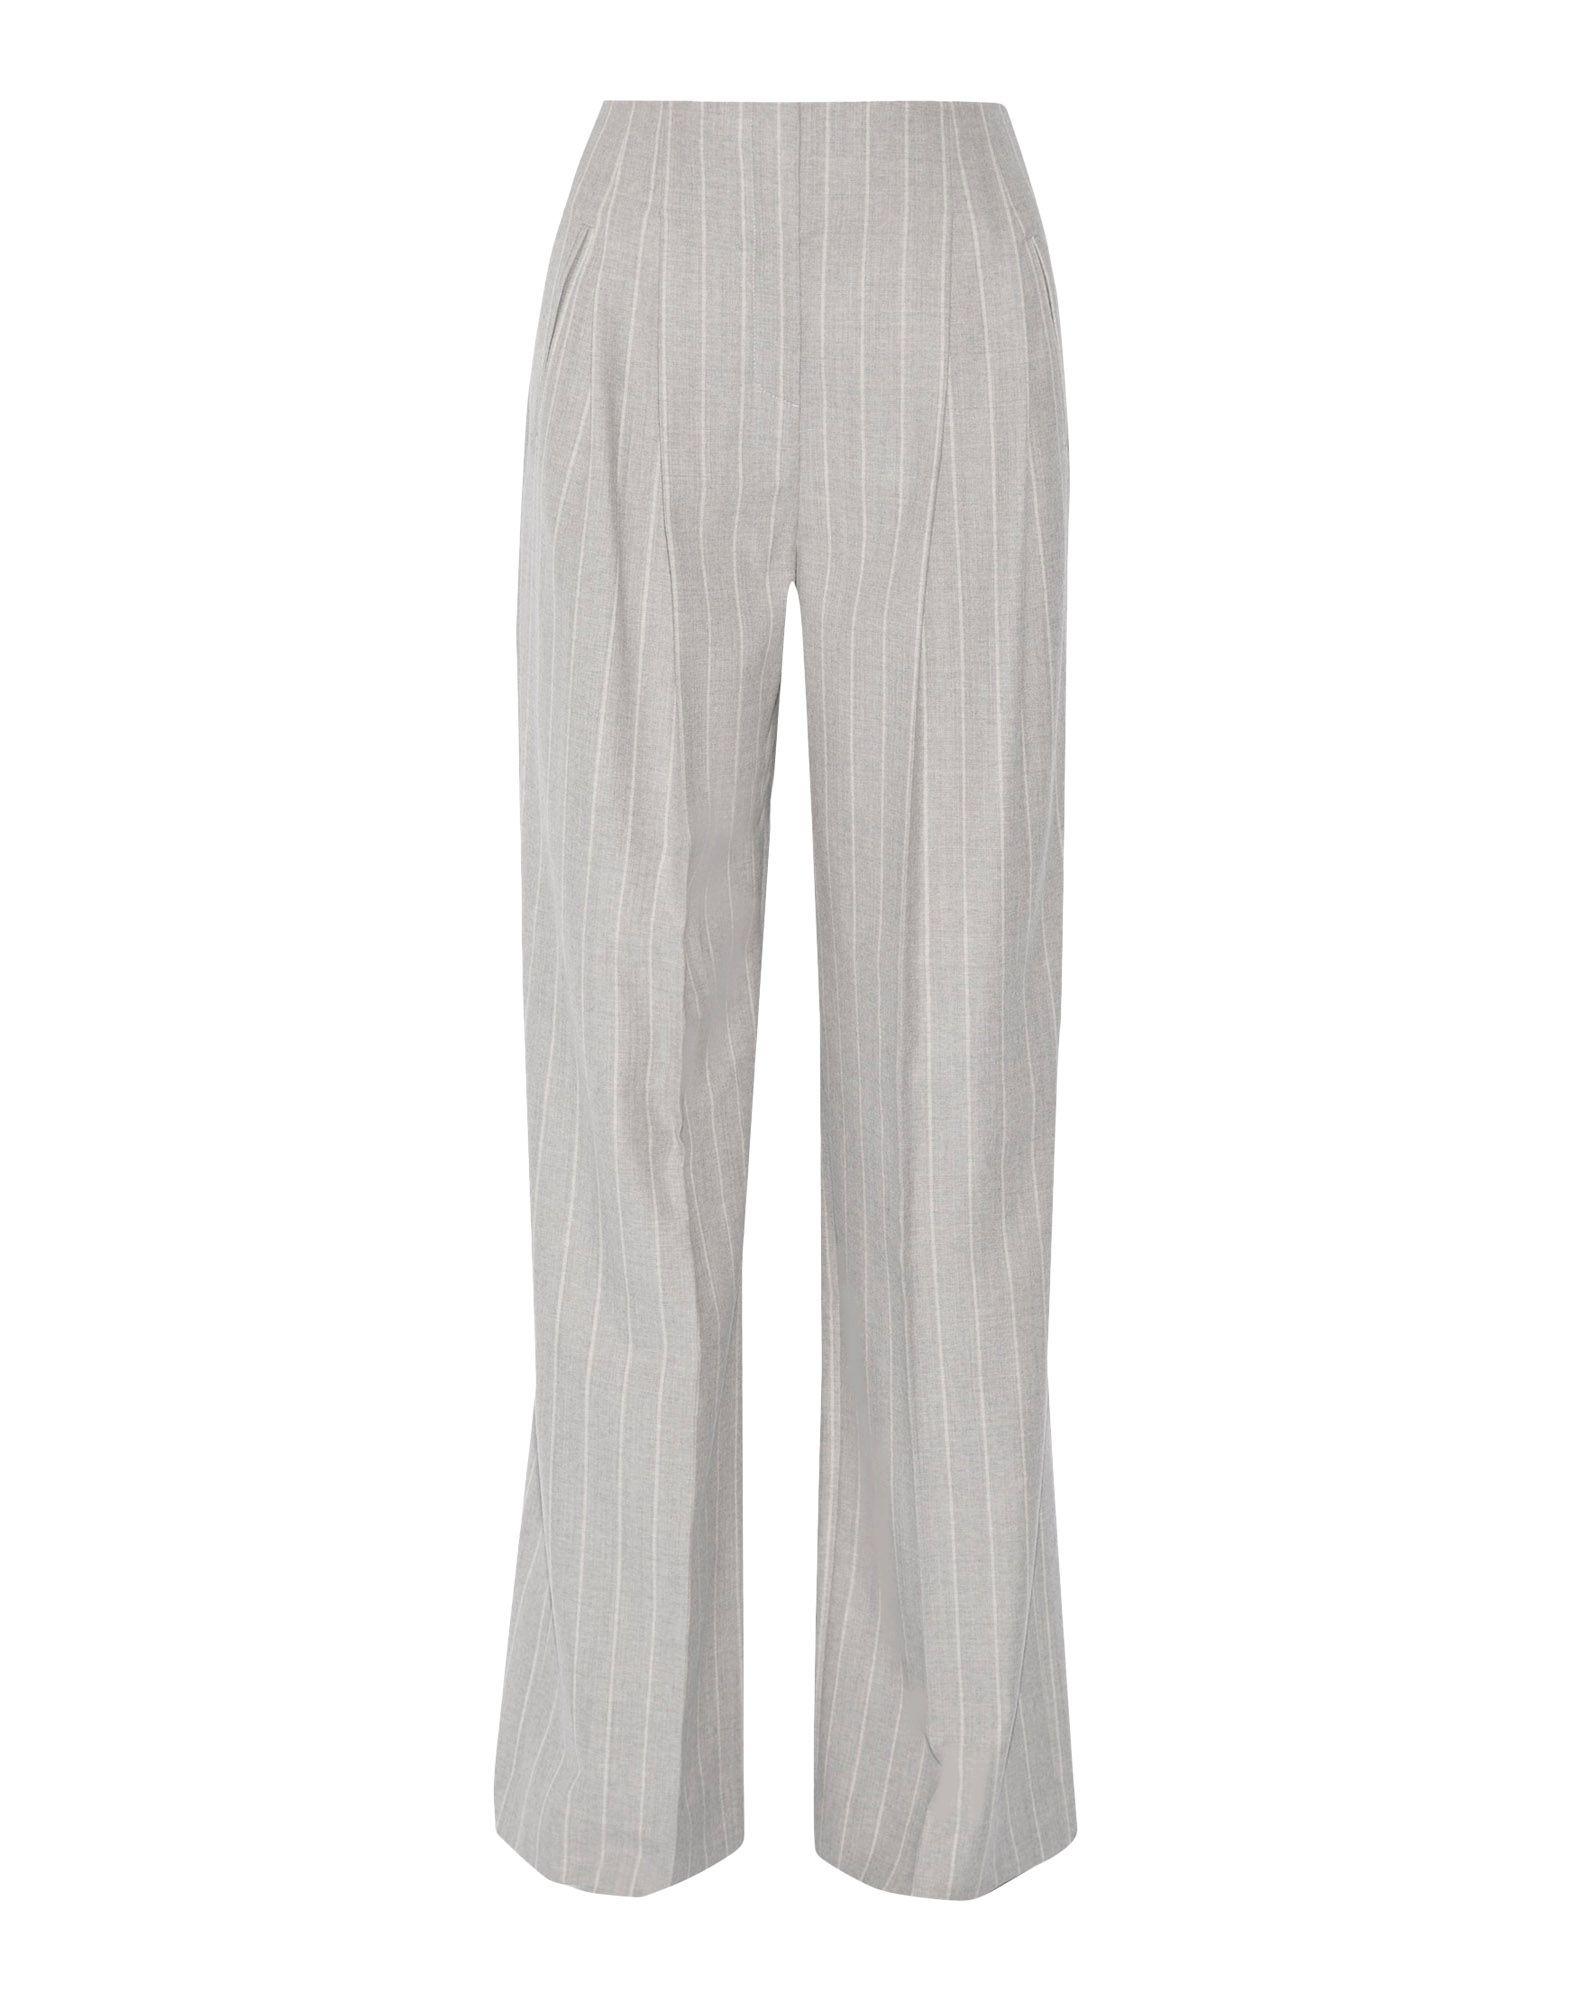 PROTAGONIST Casual Pants in Grey